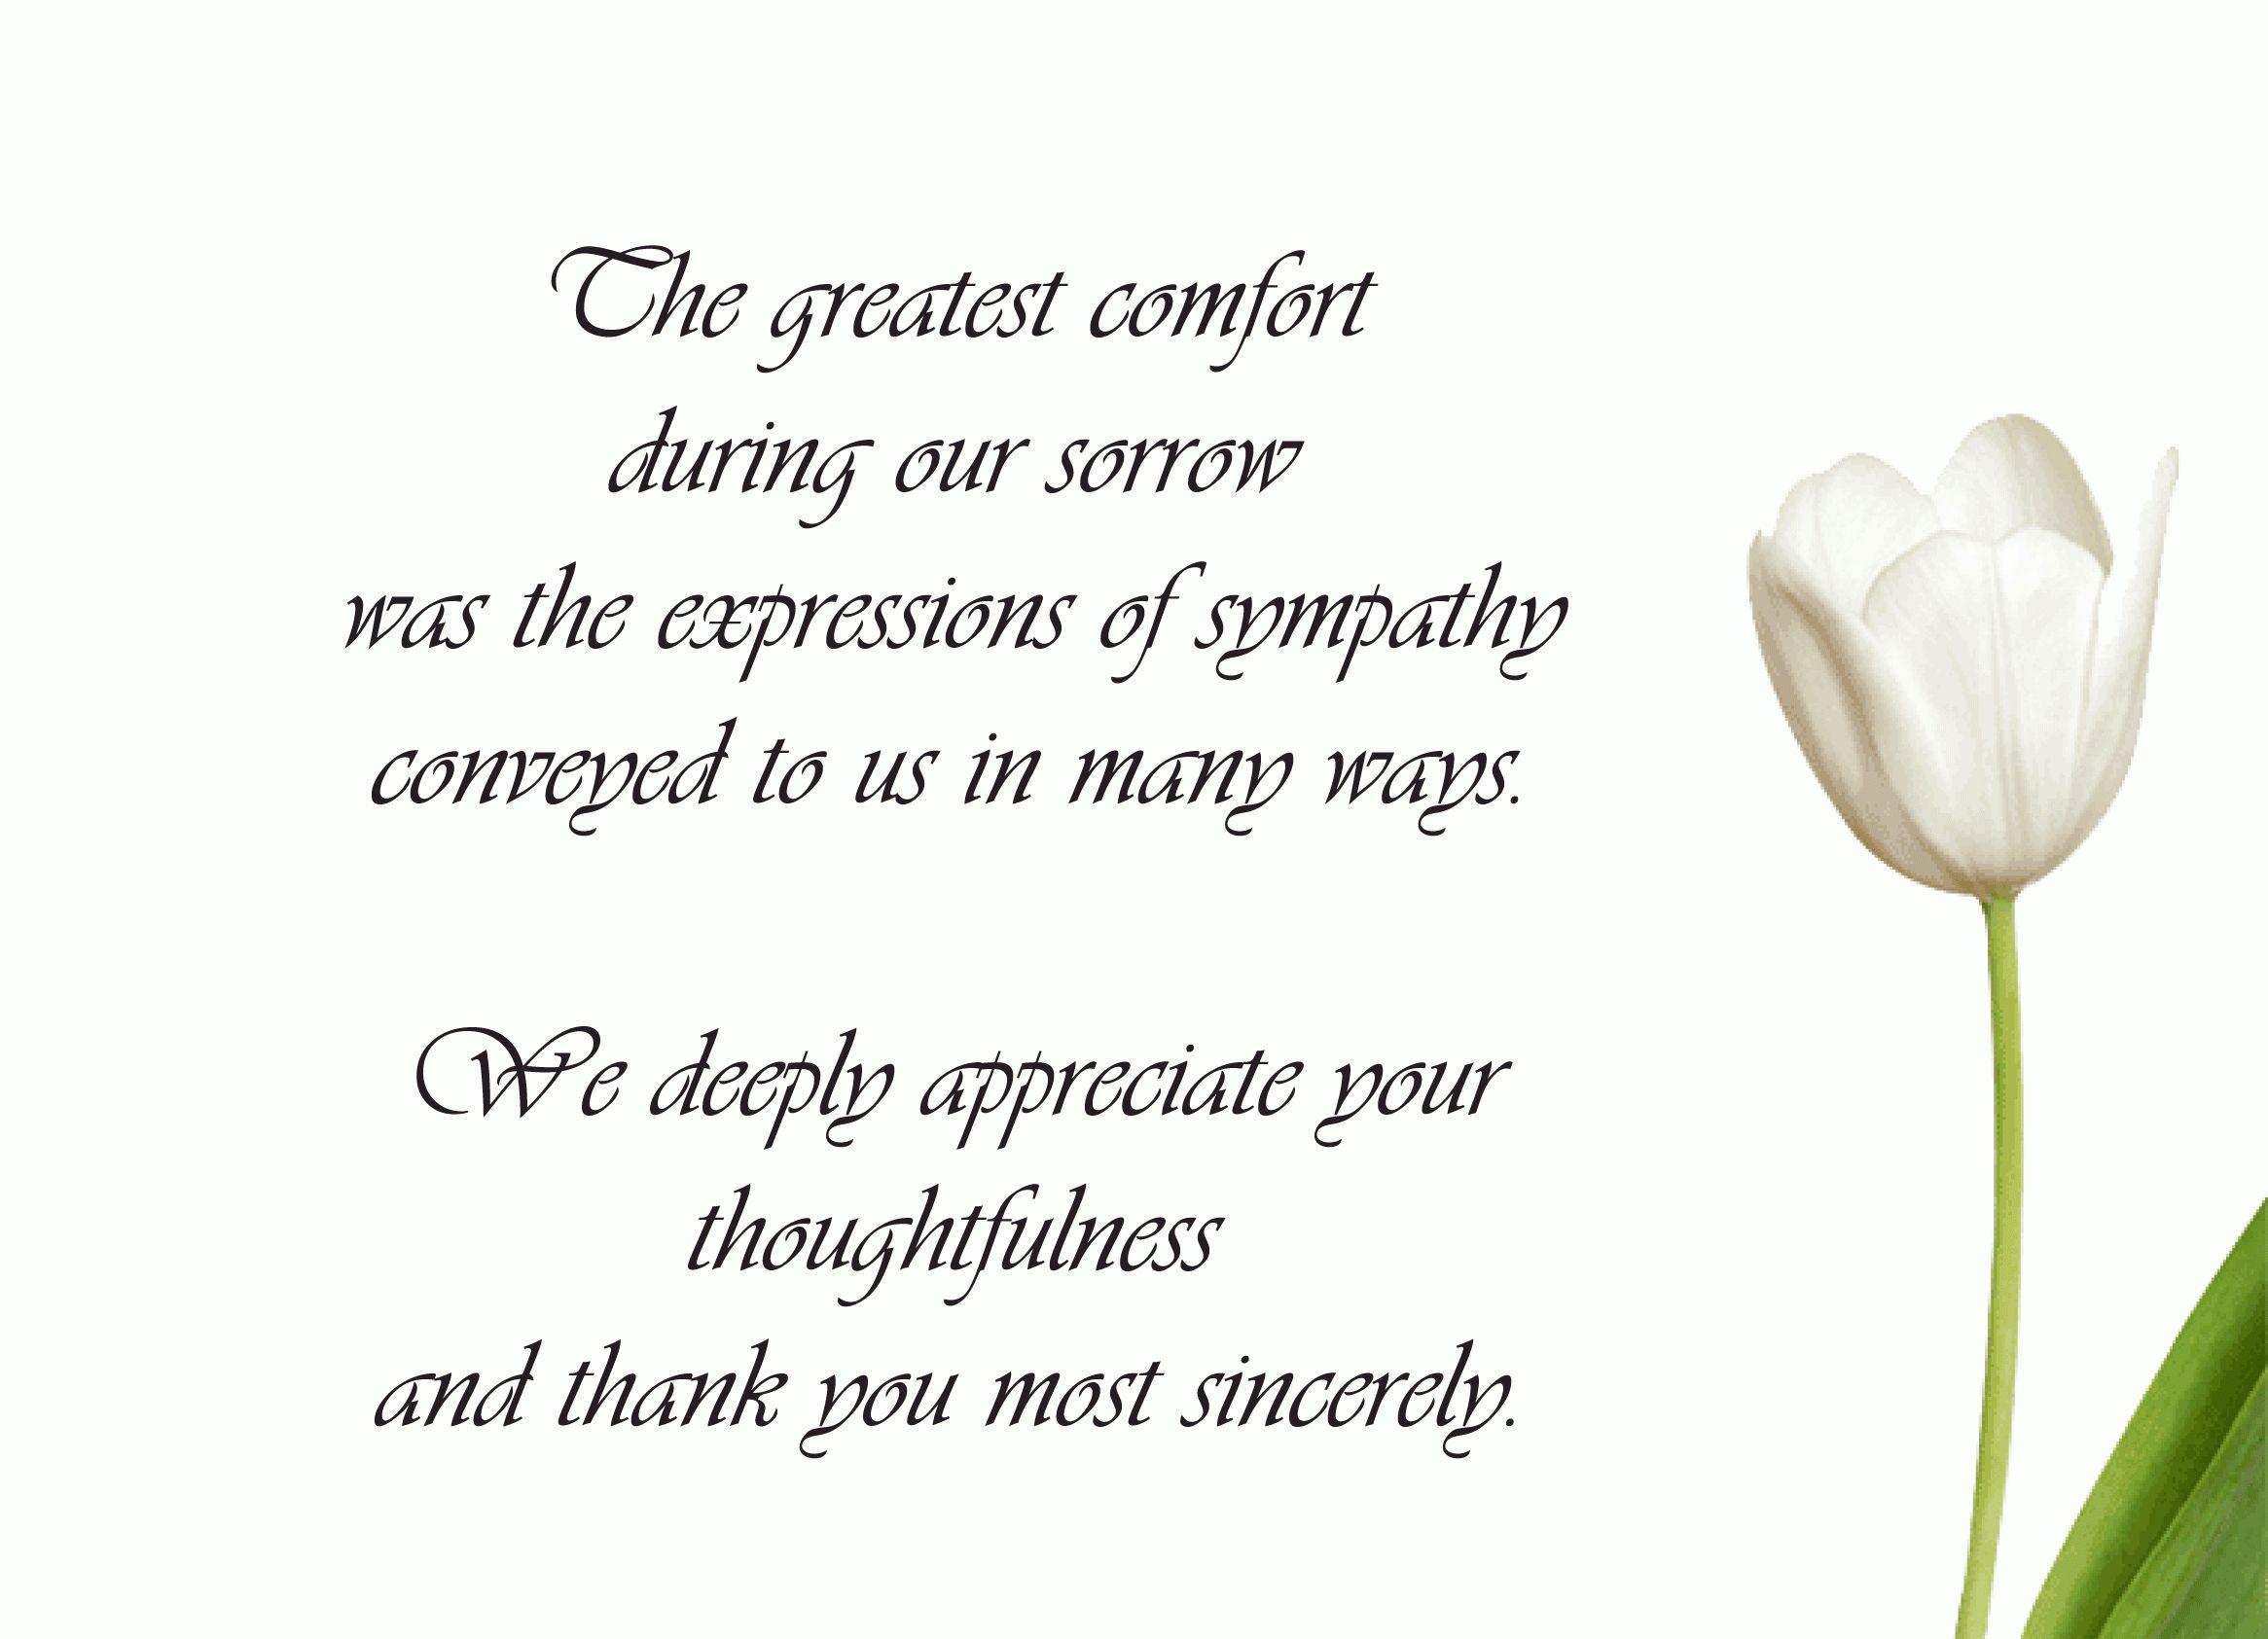 Pinkristine Wayman On Sympathy Thank Yous Funeral Regarding Sympathy Thank You Card Funeral Thank You Cards Sympathy Thank You Cards Sympathy Thank You Notes